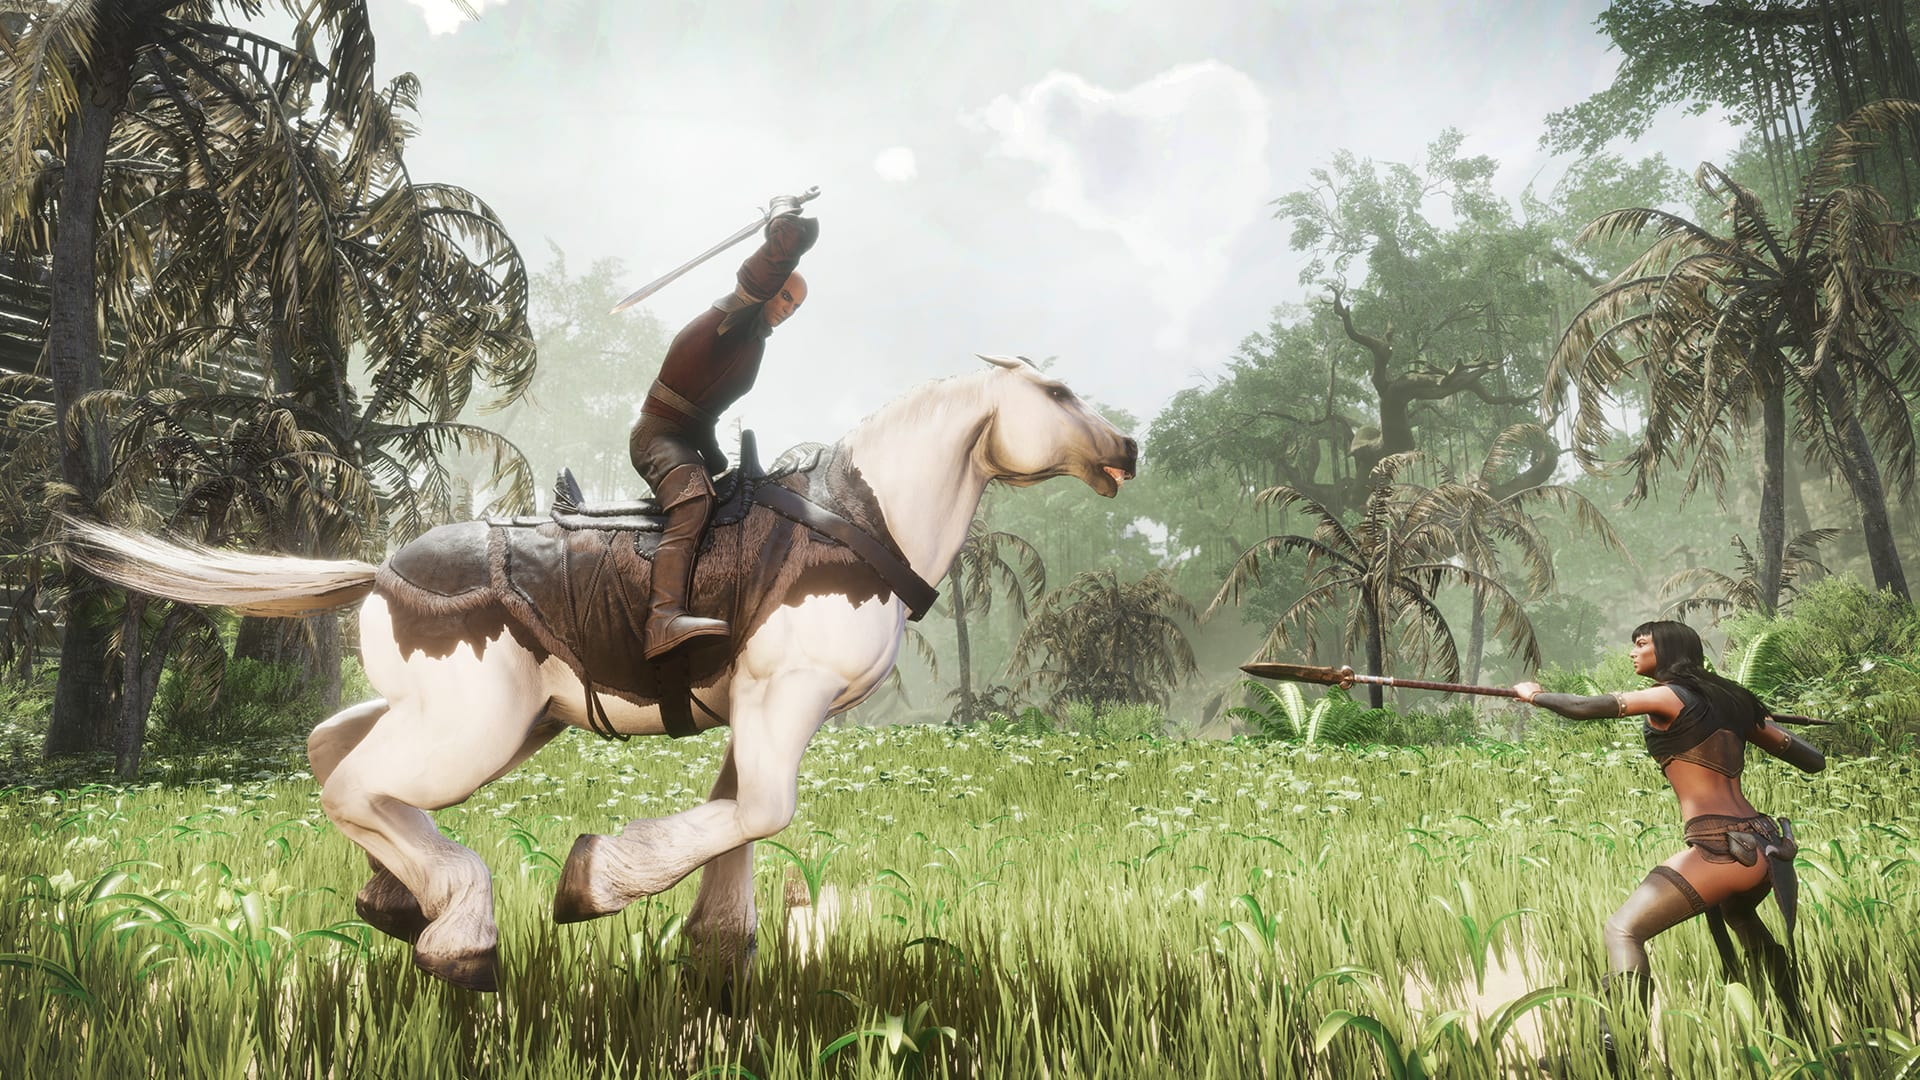 conan exiles, mounts, mounted combat, ryders of hyboria